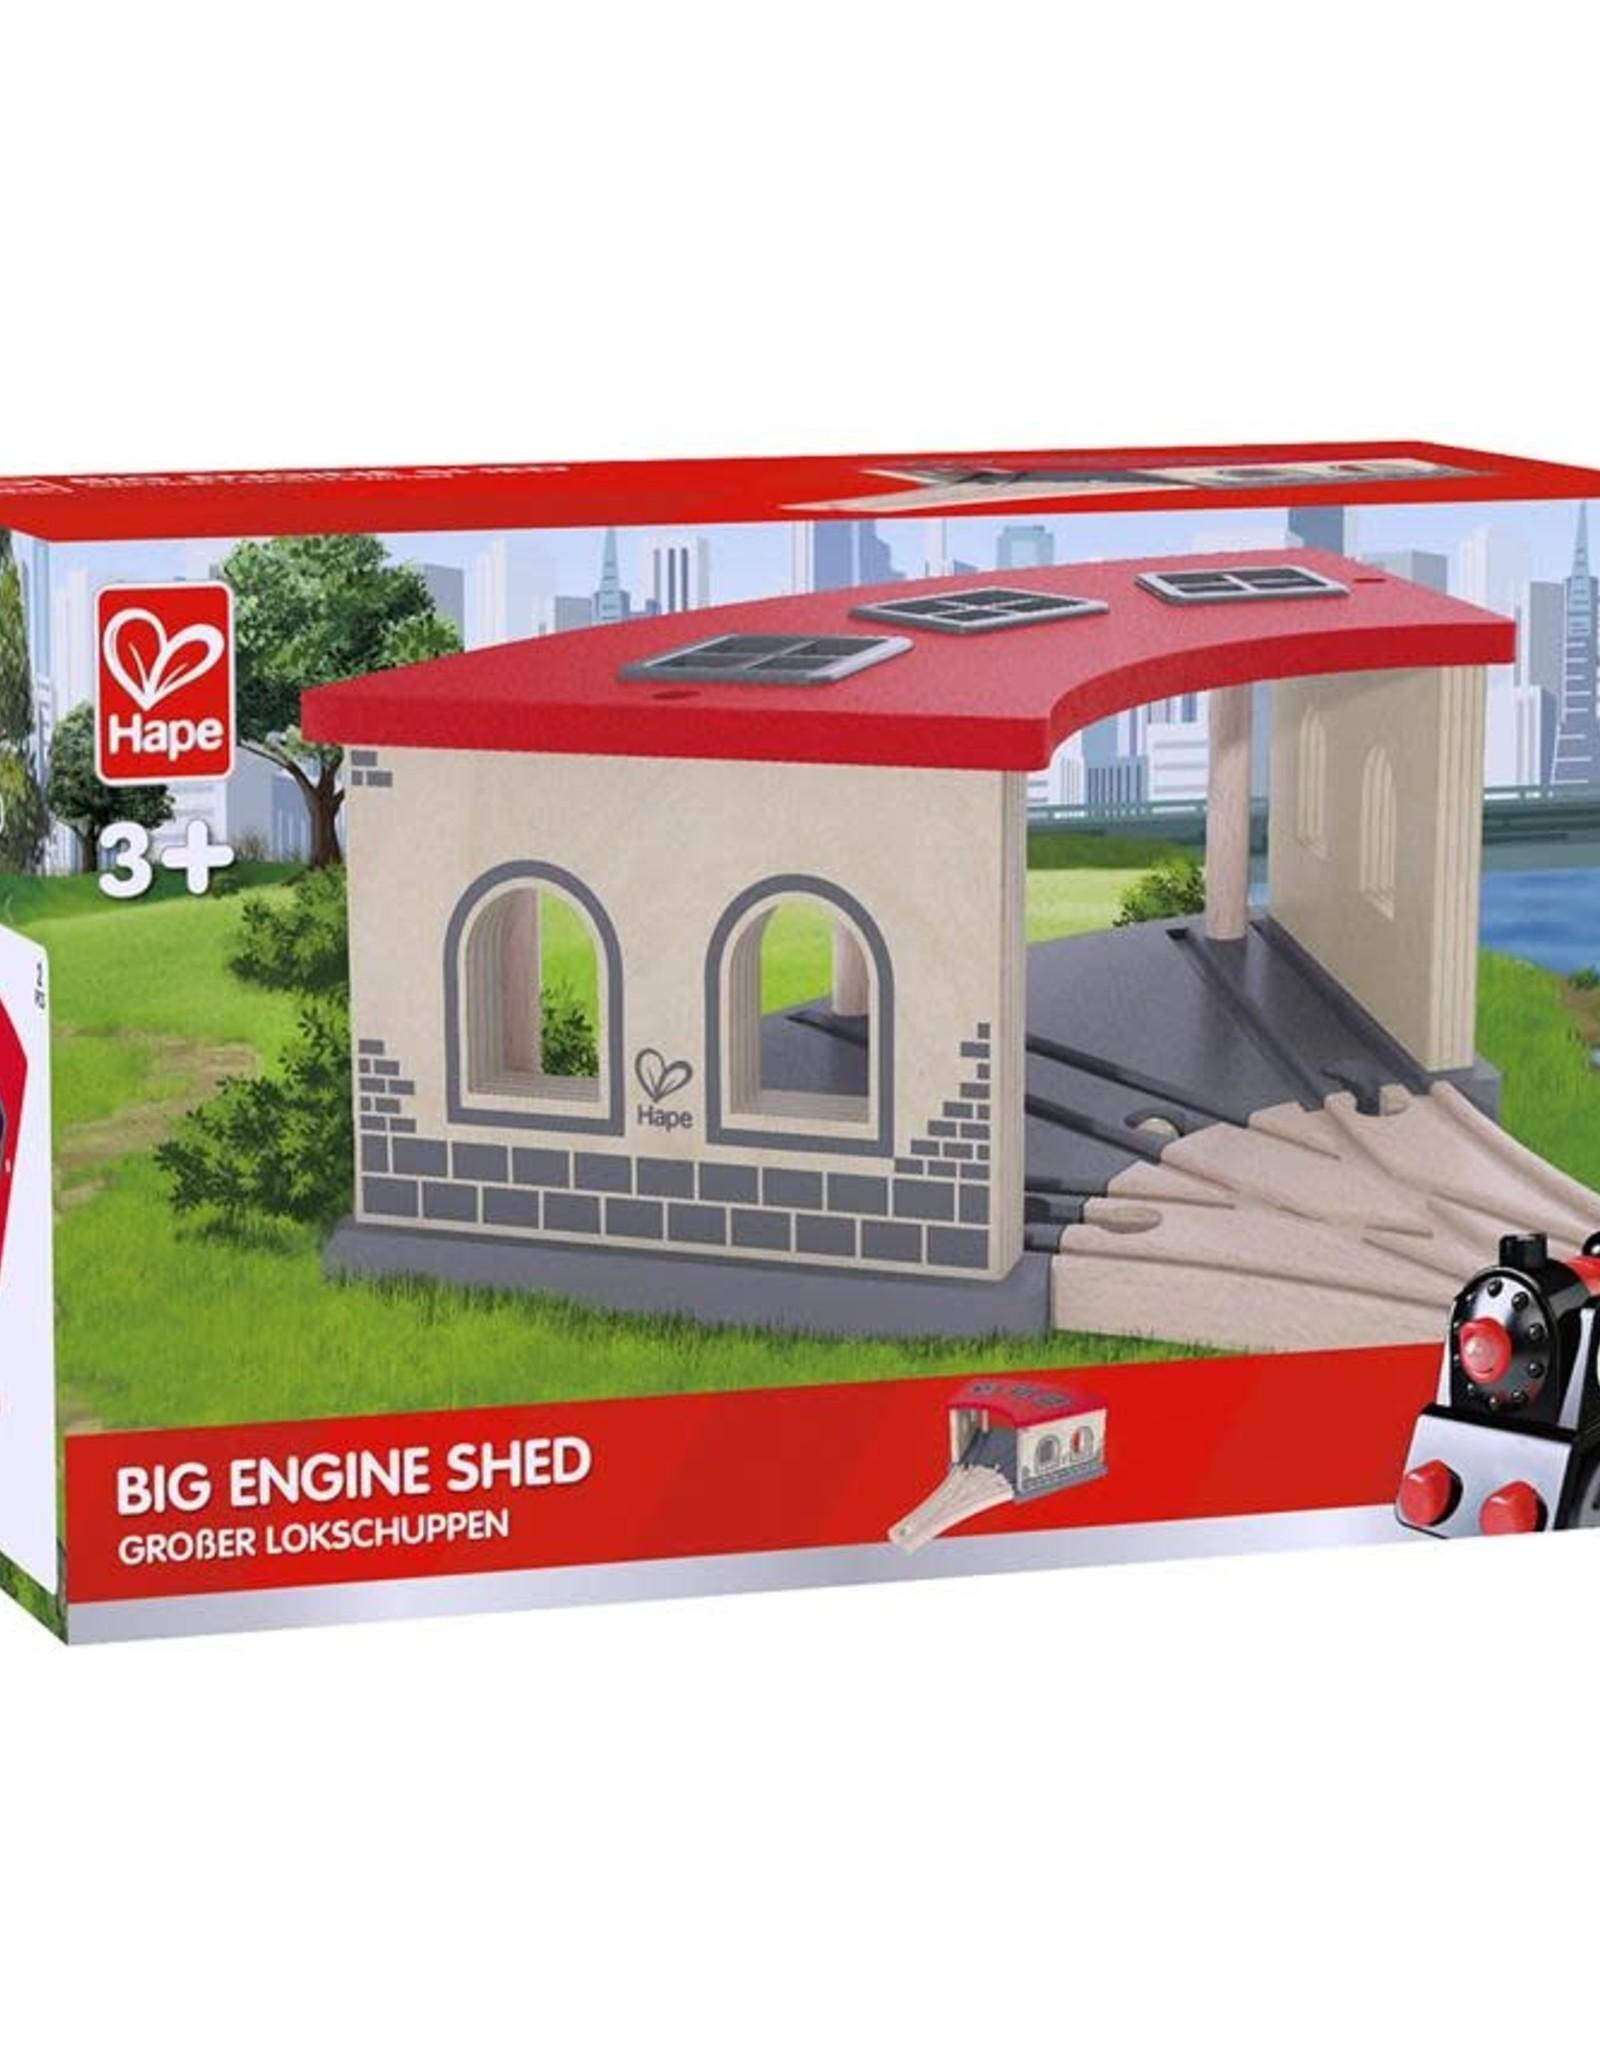 Hape Big Engine Shed